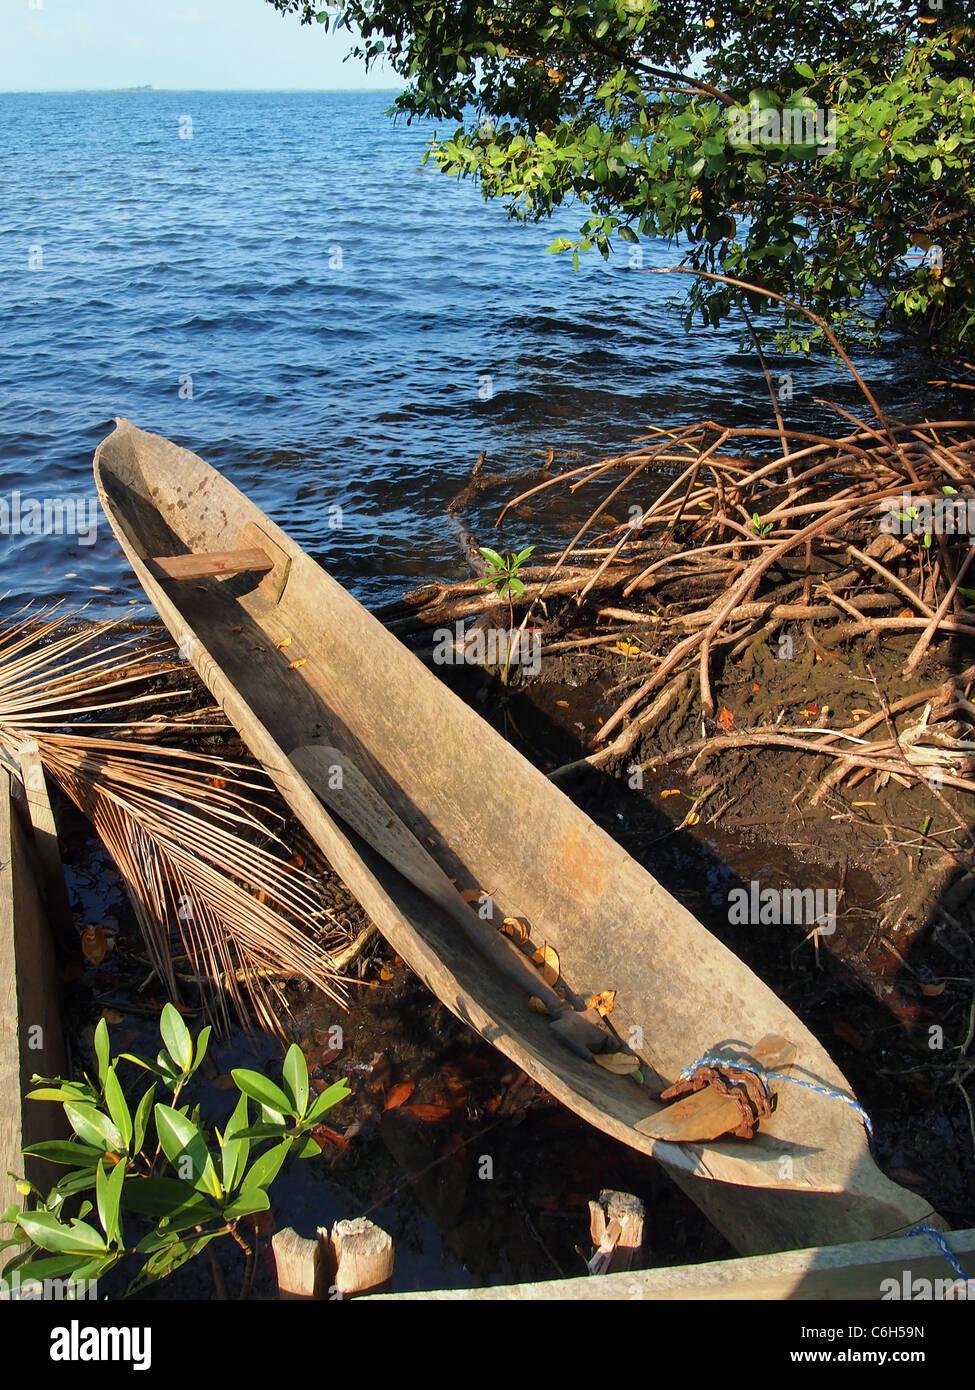 Amerindian dugout canoe in Bocas del Toro, caribbean sea, Panama - Stock Image